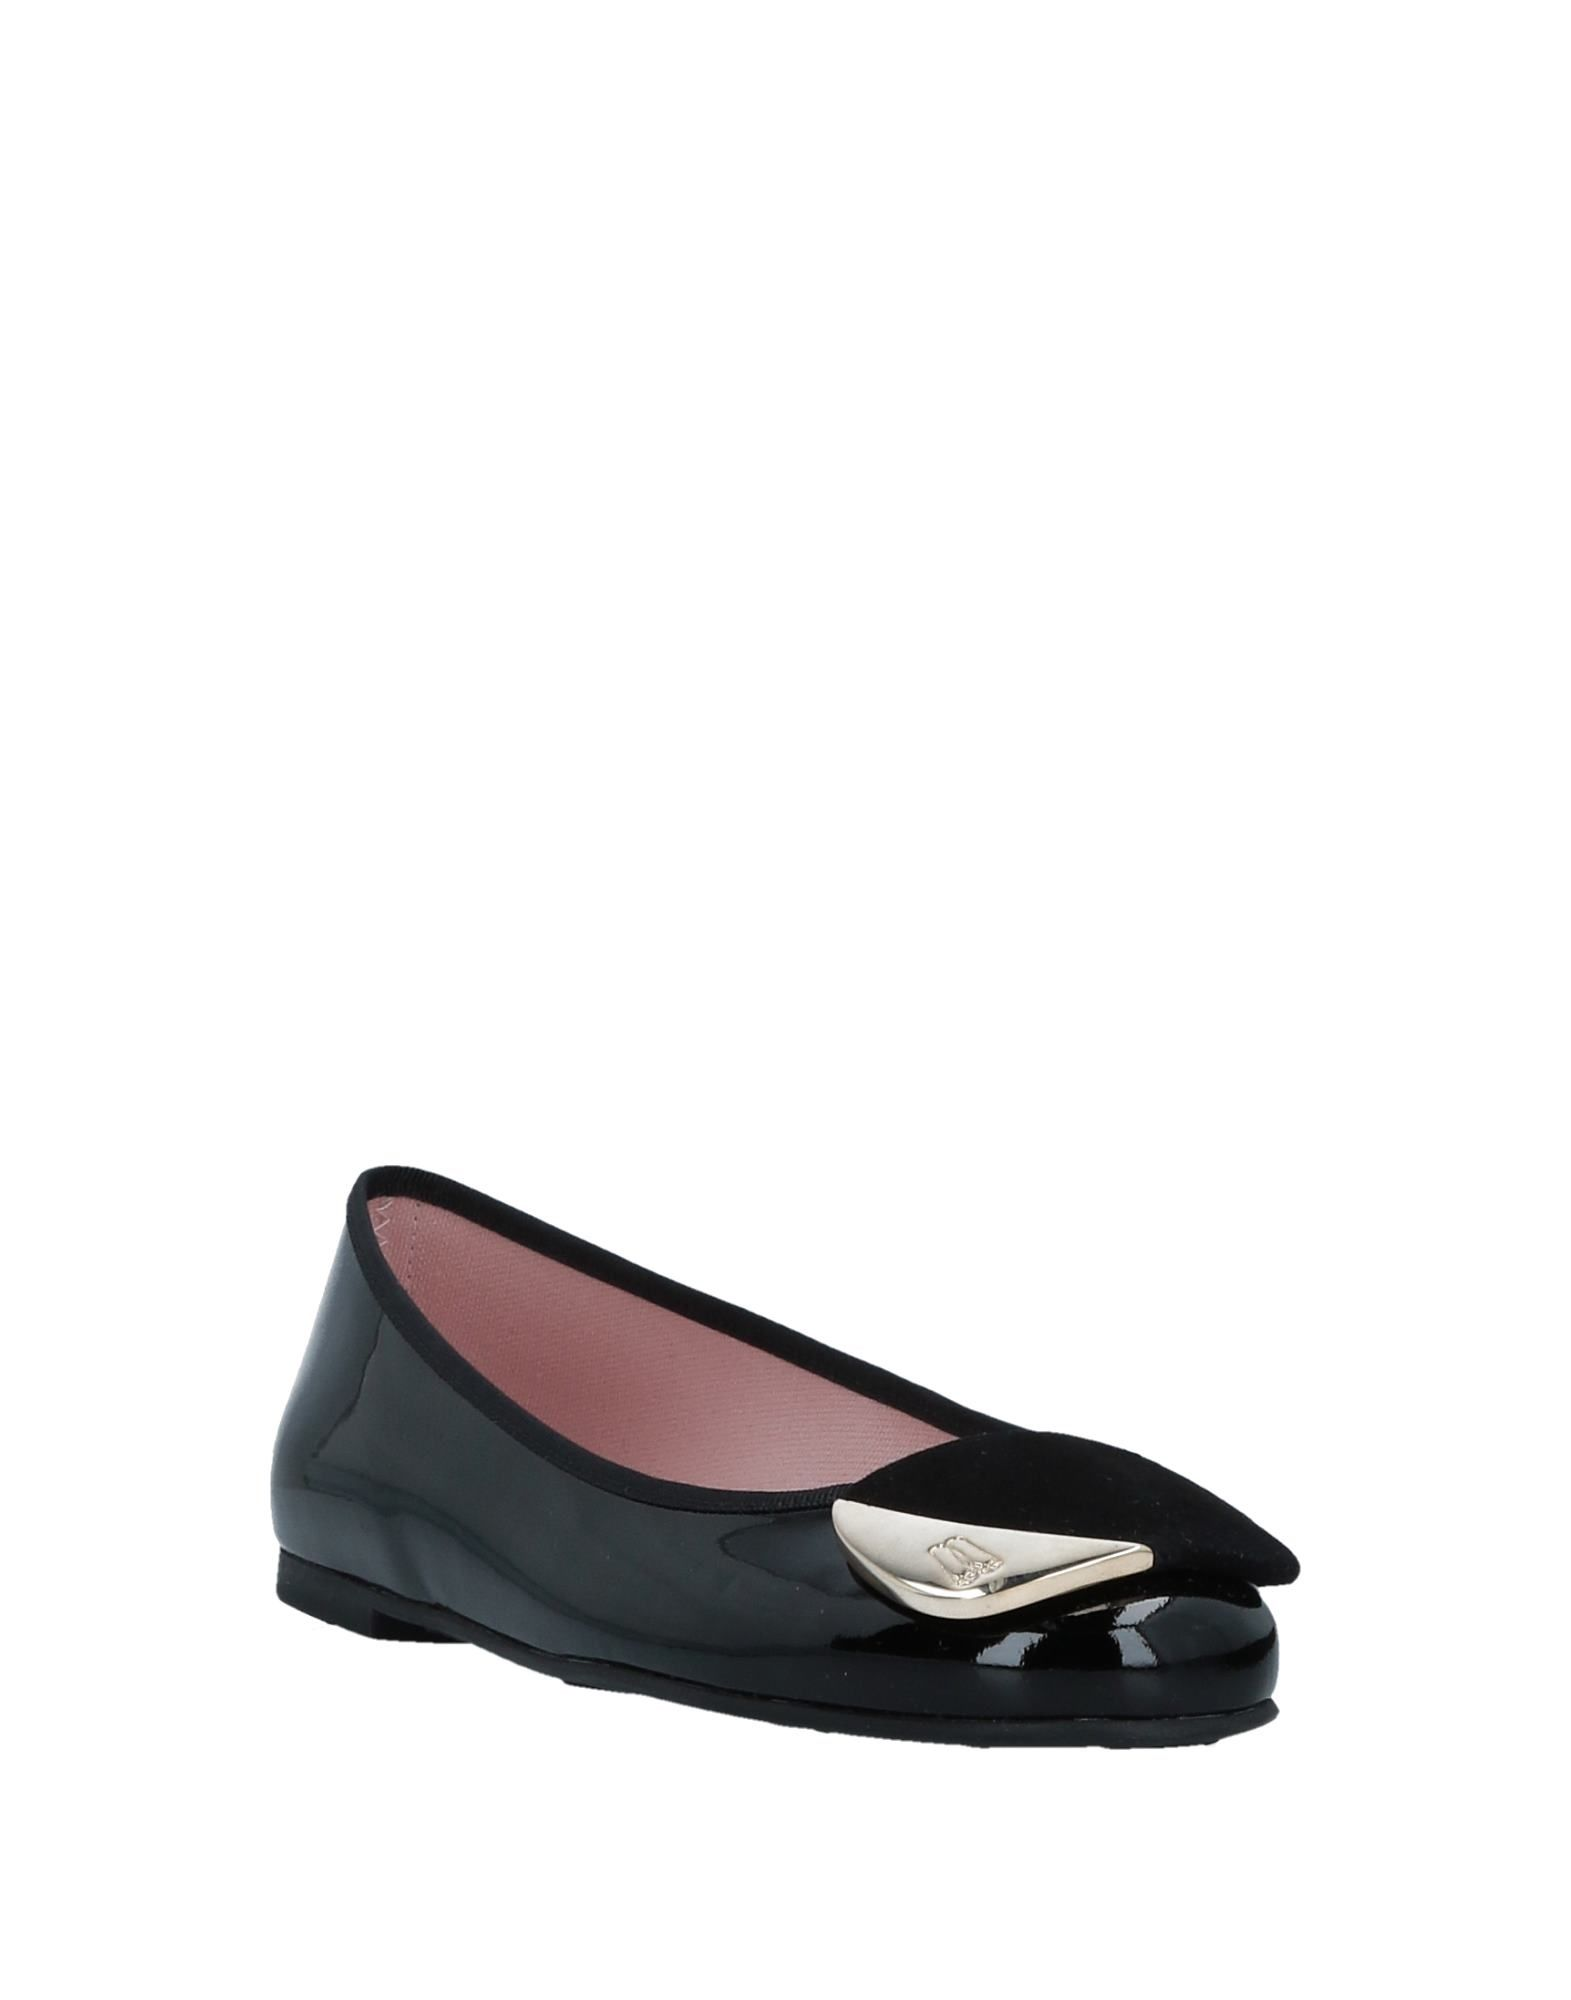 Pretty Ballerinas Gute Ballerinas Damen 11516765OO Gute Ballerinas Qualität beliebte Schuhe 253ec8